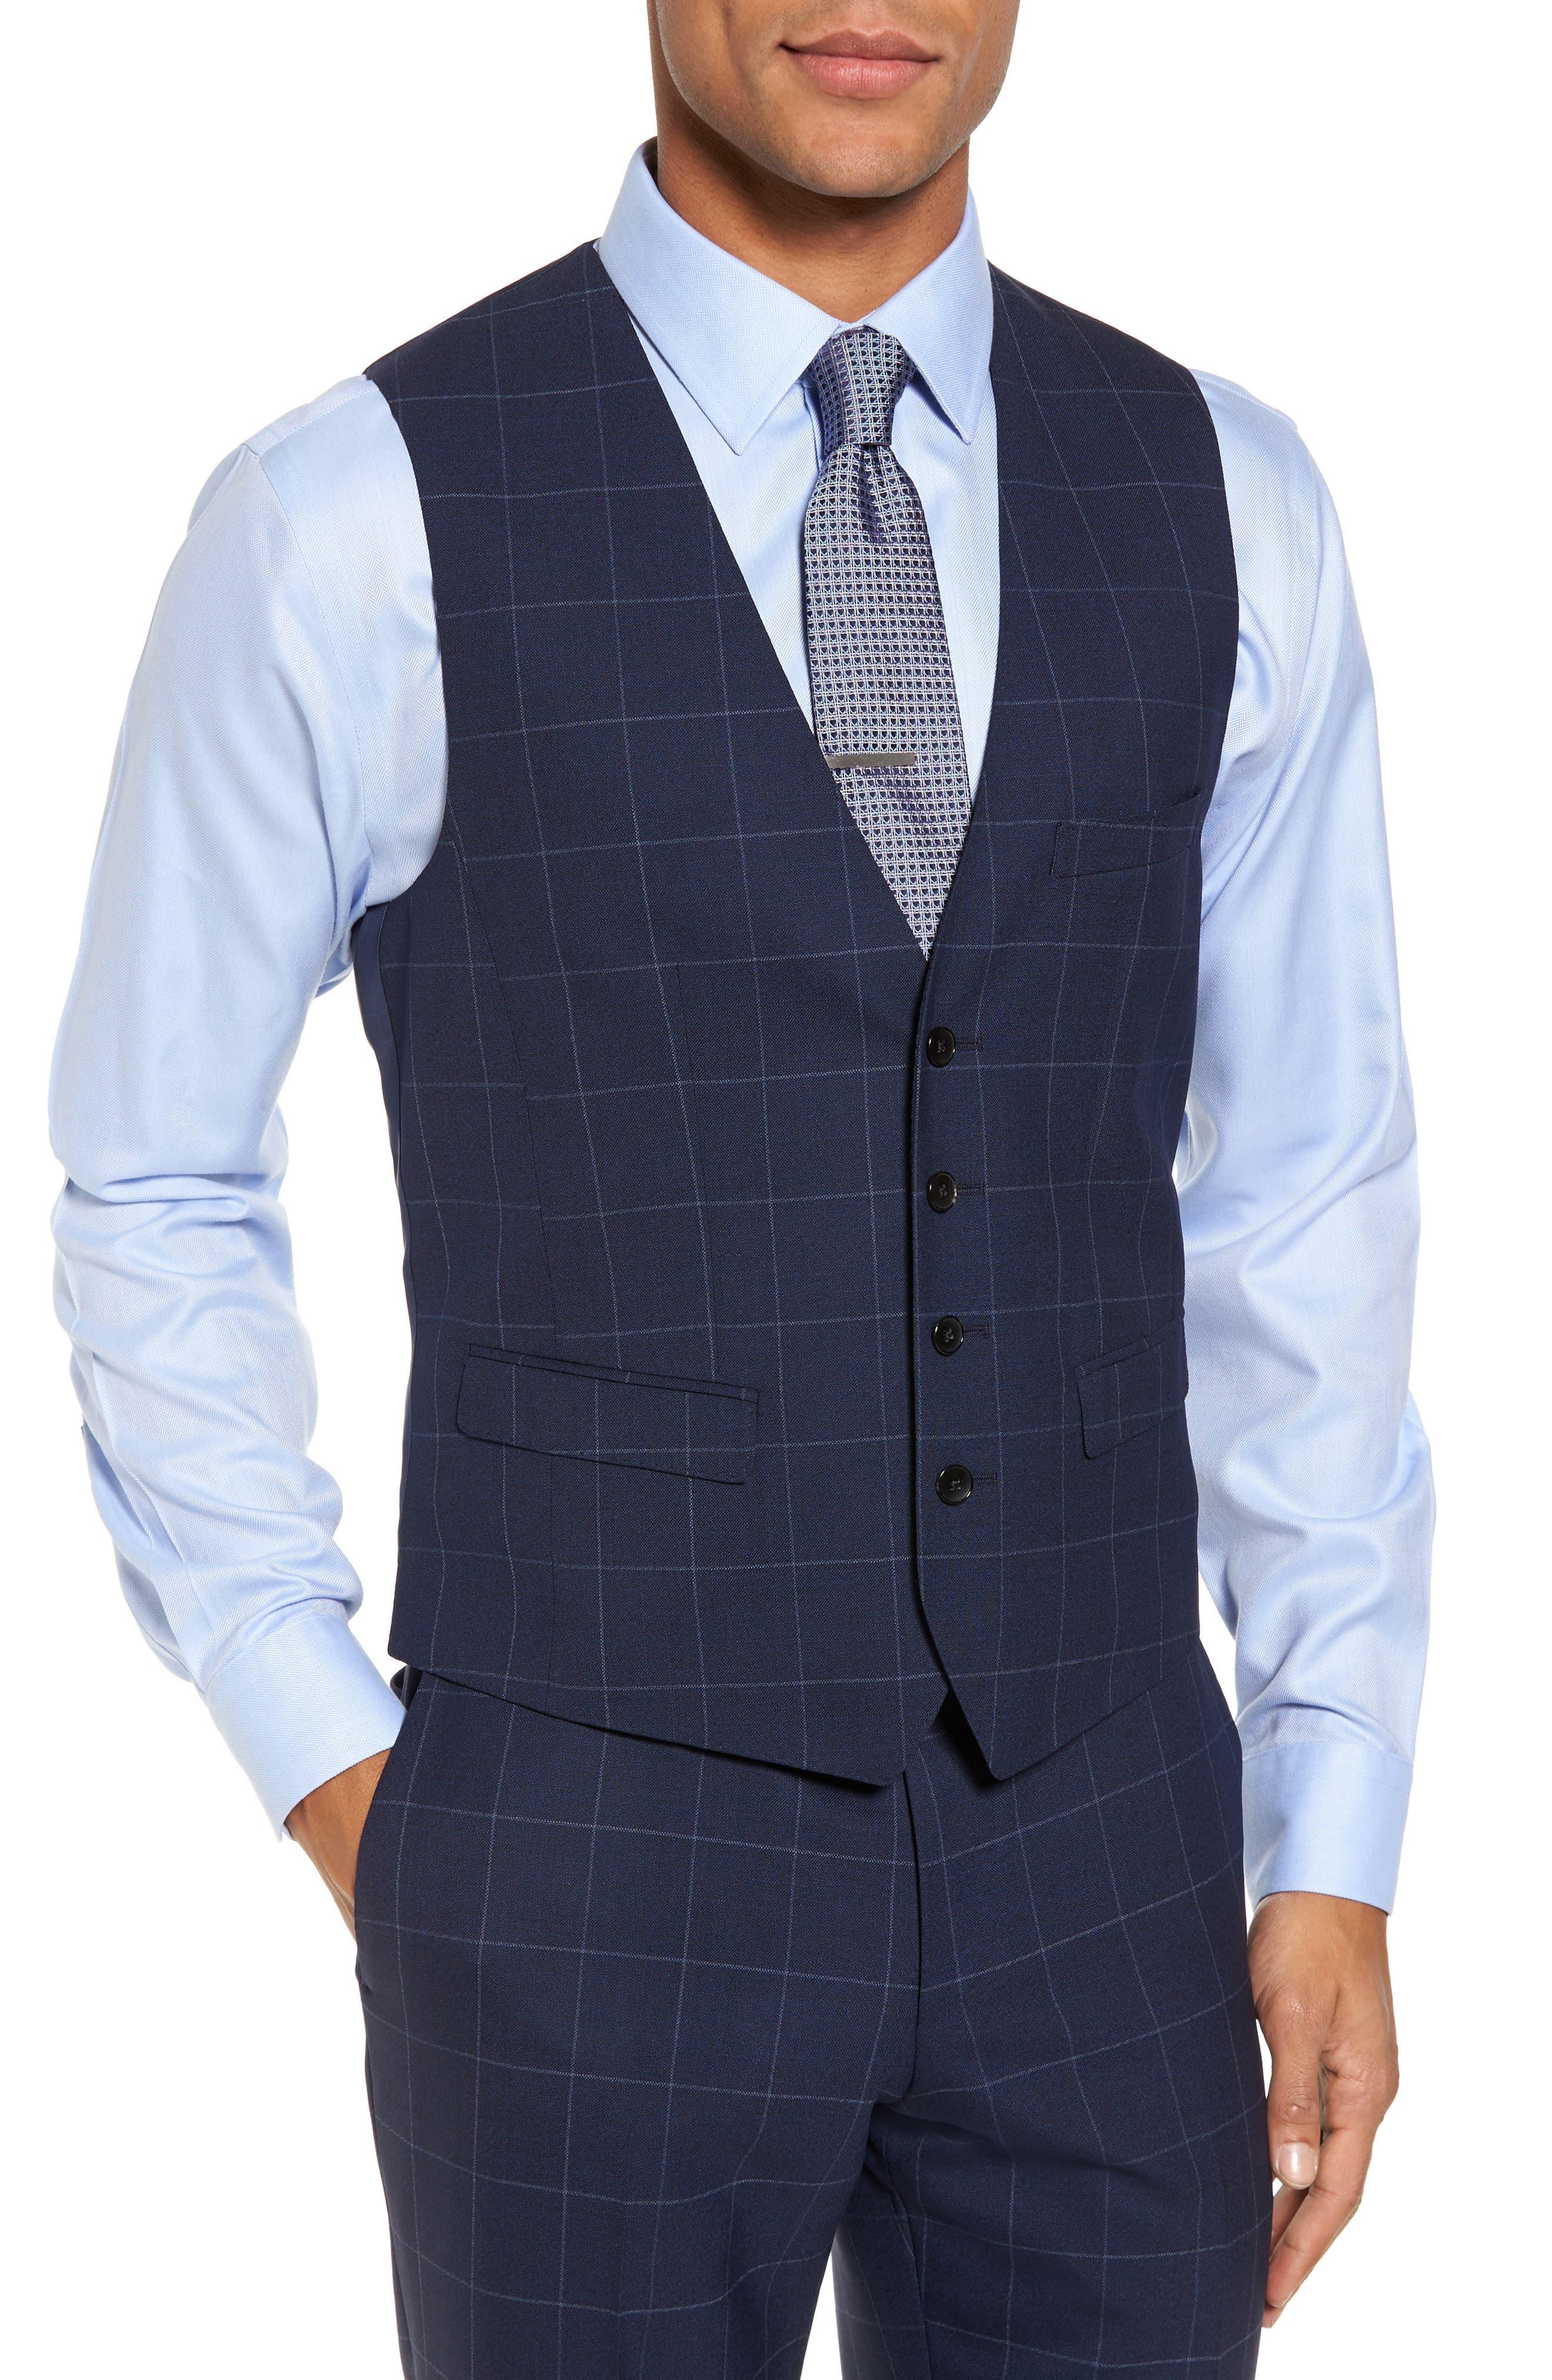 Huge/Genius Trim Fit Three Piece Windowpane Wool Suit,                             Alternate thumbnail 6, color,                             Navy